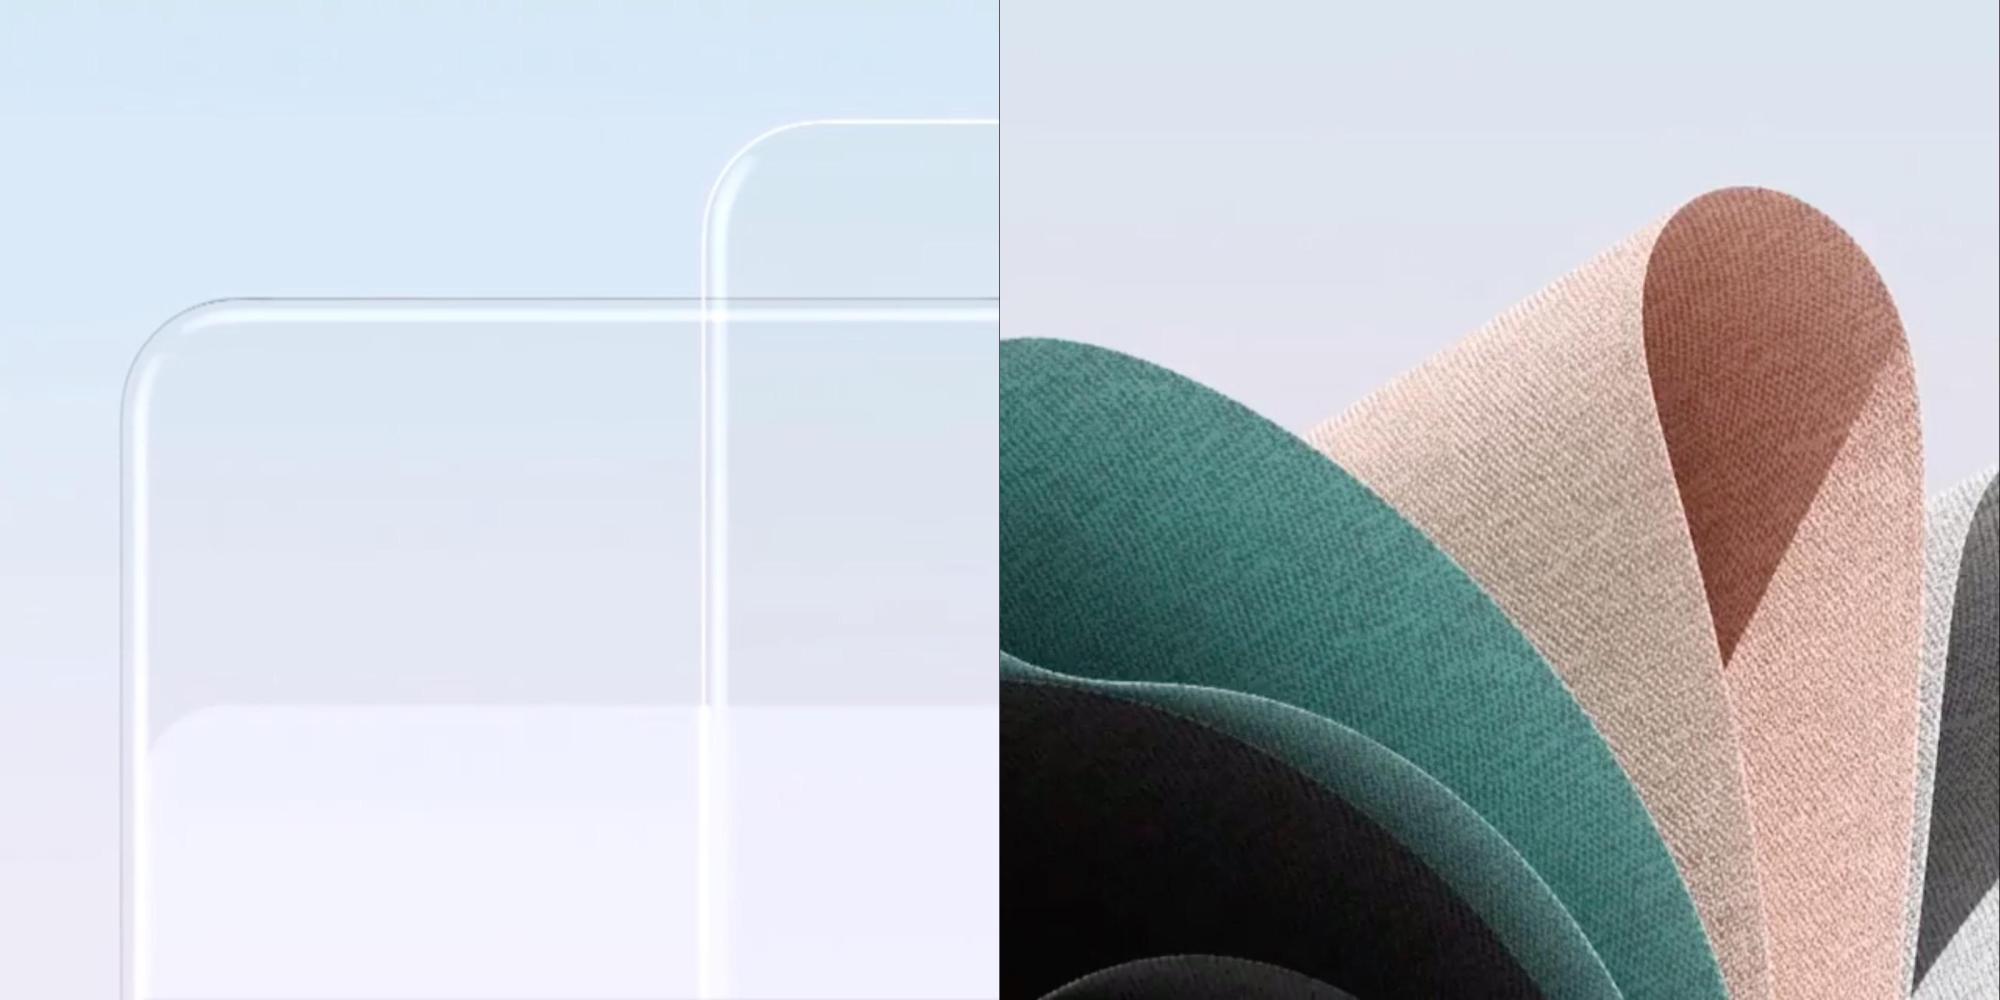 [Update: More] Watch Google's entrancing design videos for Pixel 3, Nest Hub